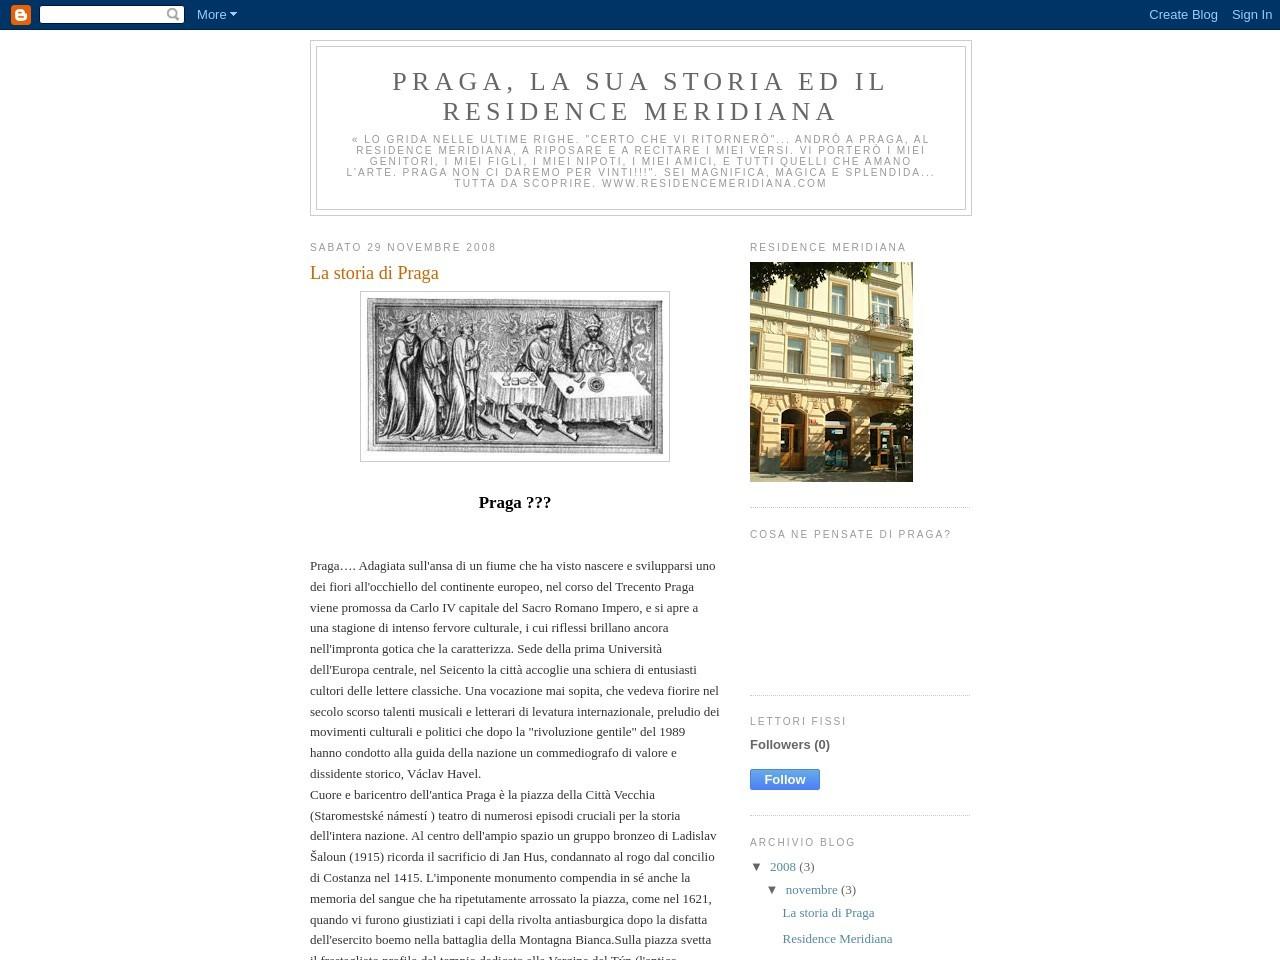 praga-la-sua-storia-ed-il-residence-meridiana